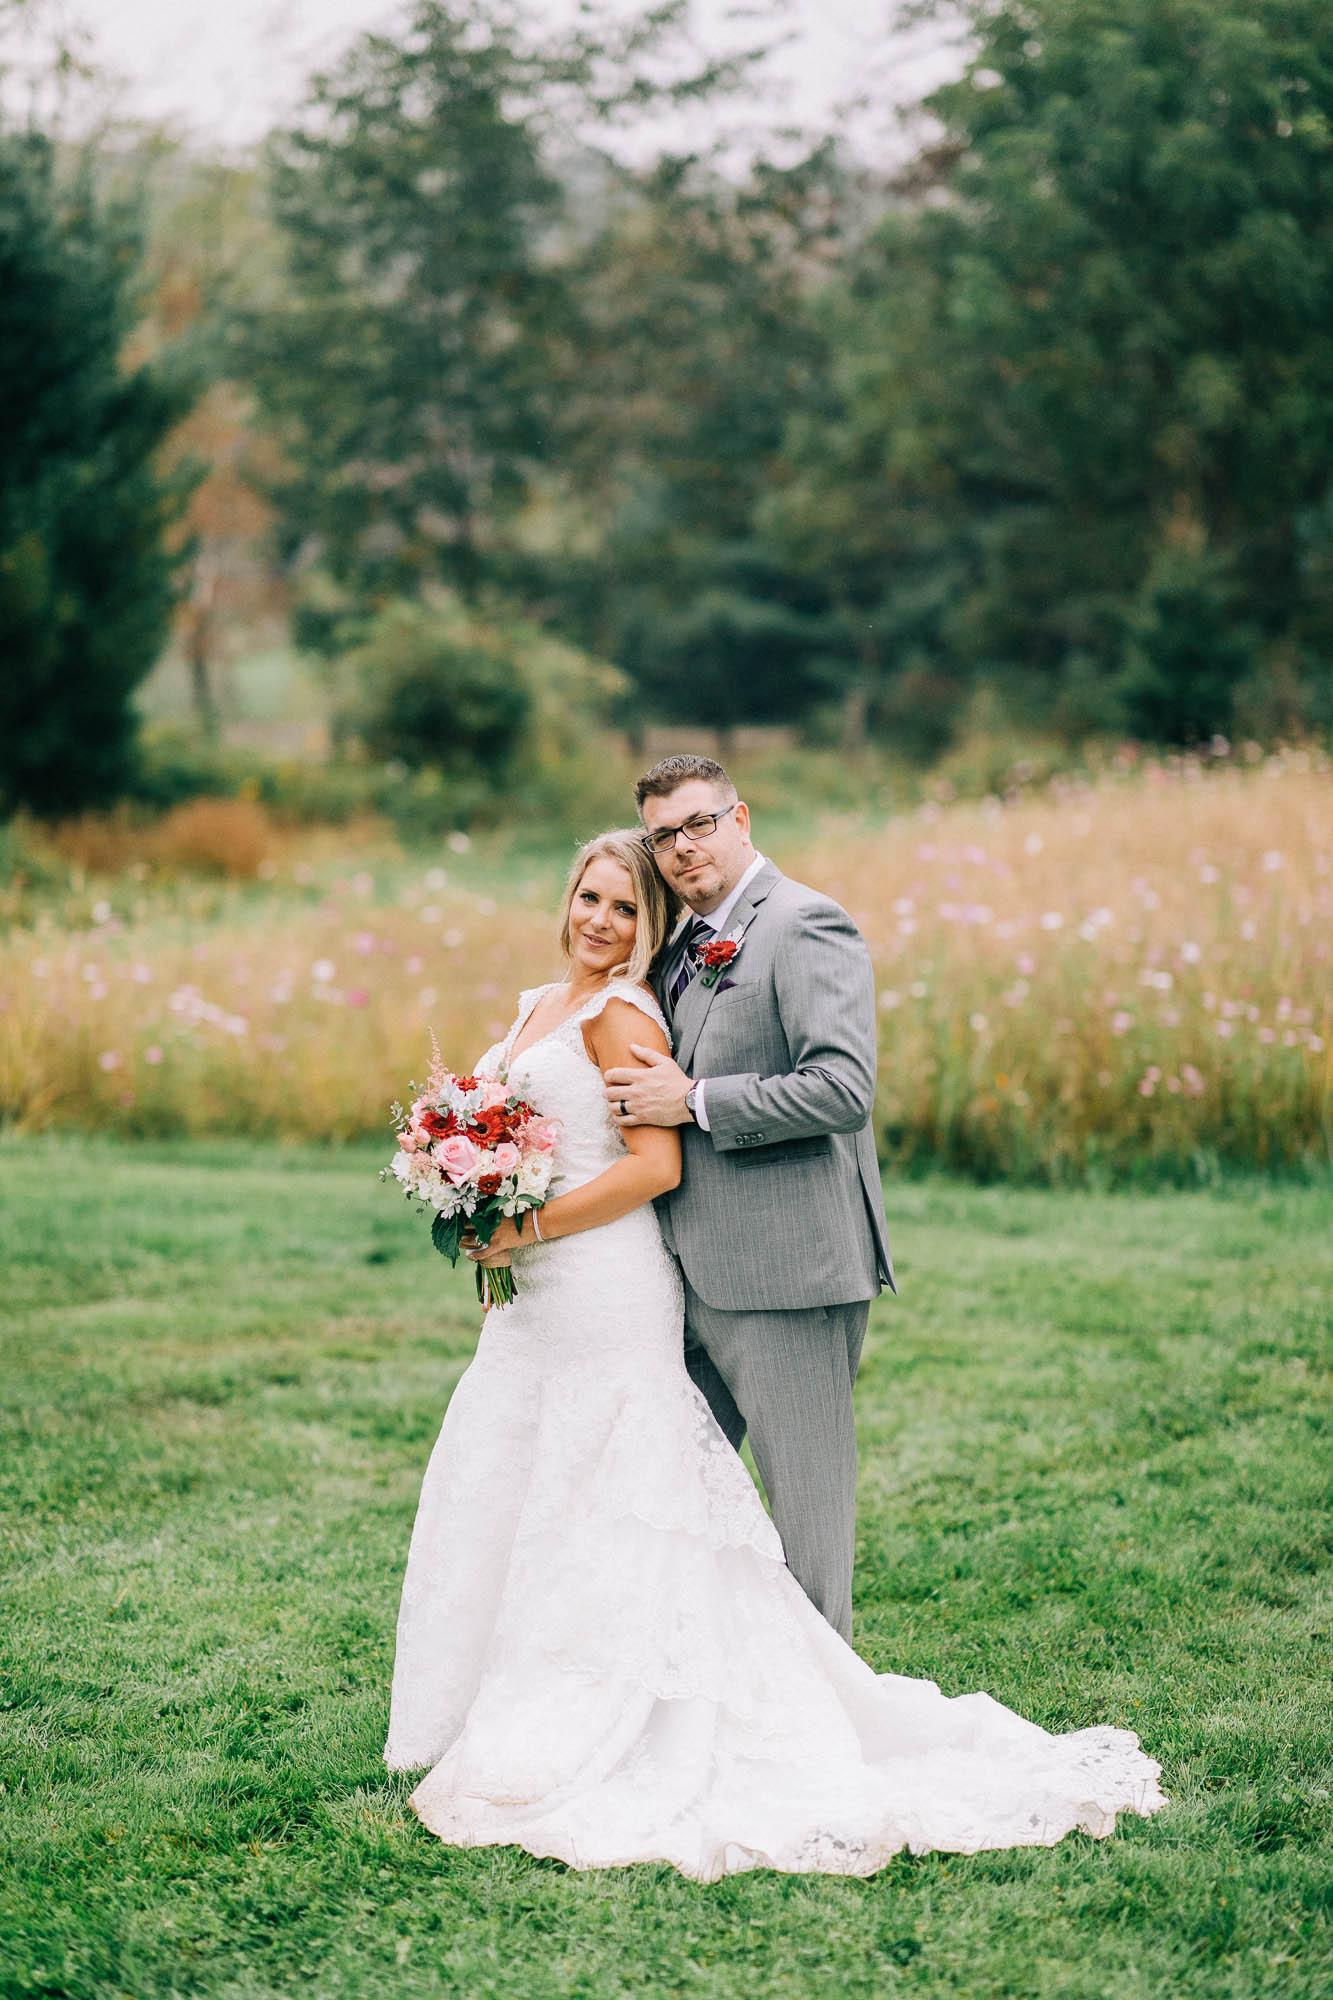 Lodge-at-Raven-Creek-October-wedding-51.jpg